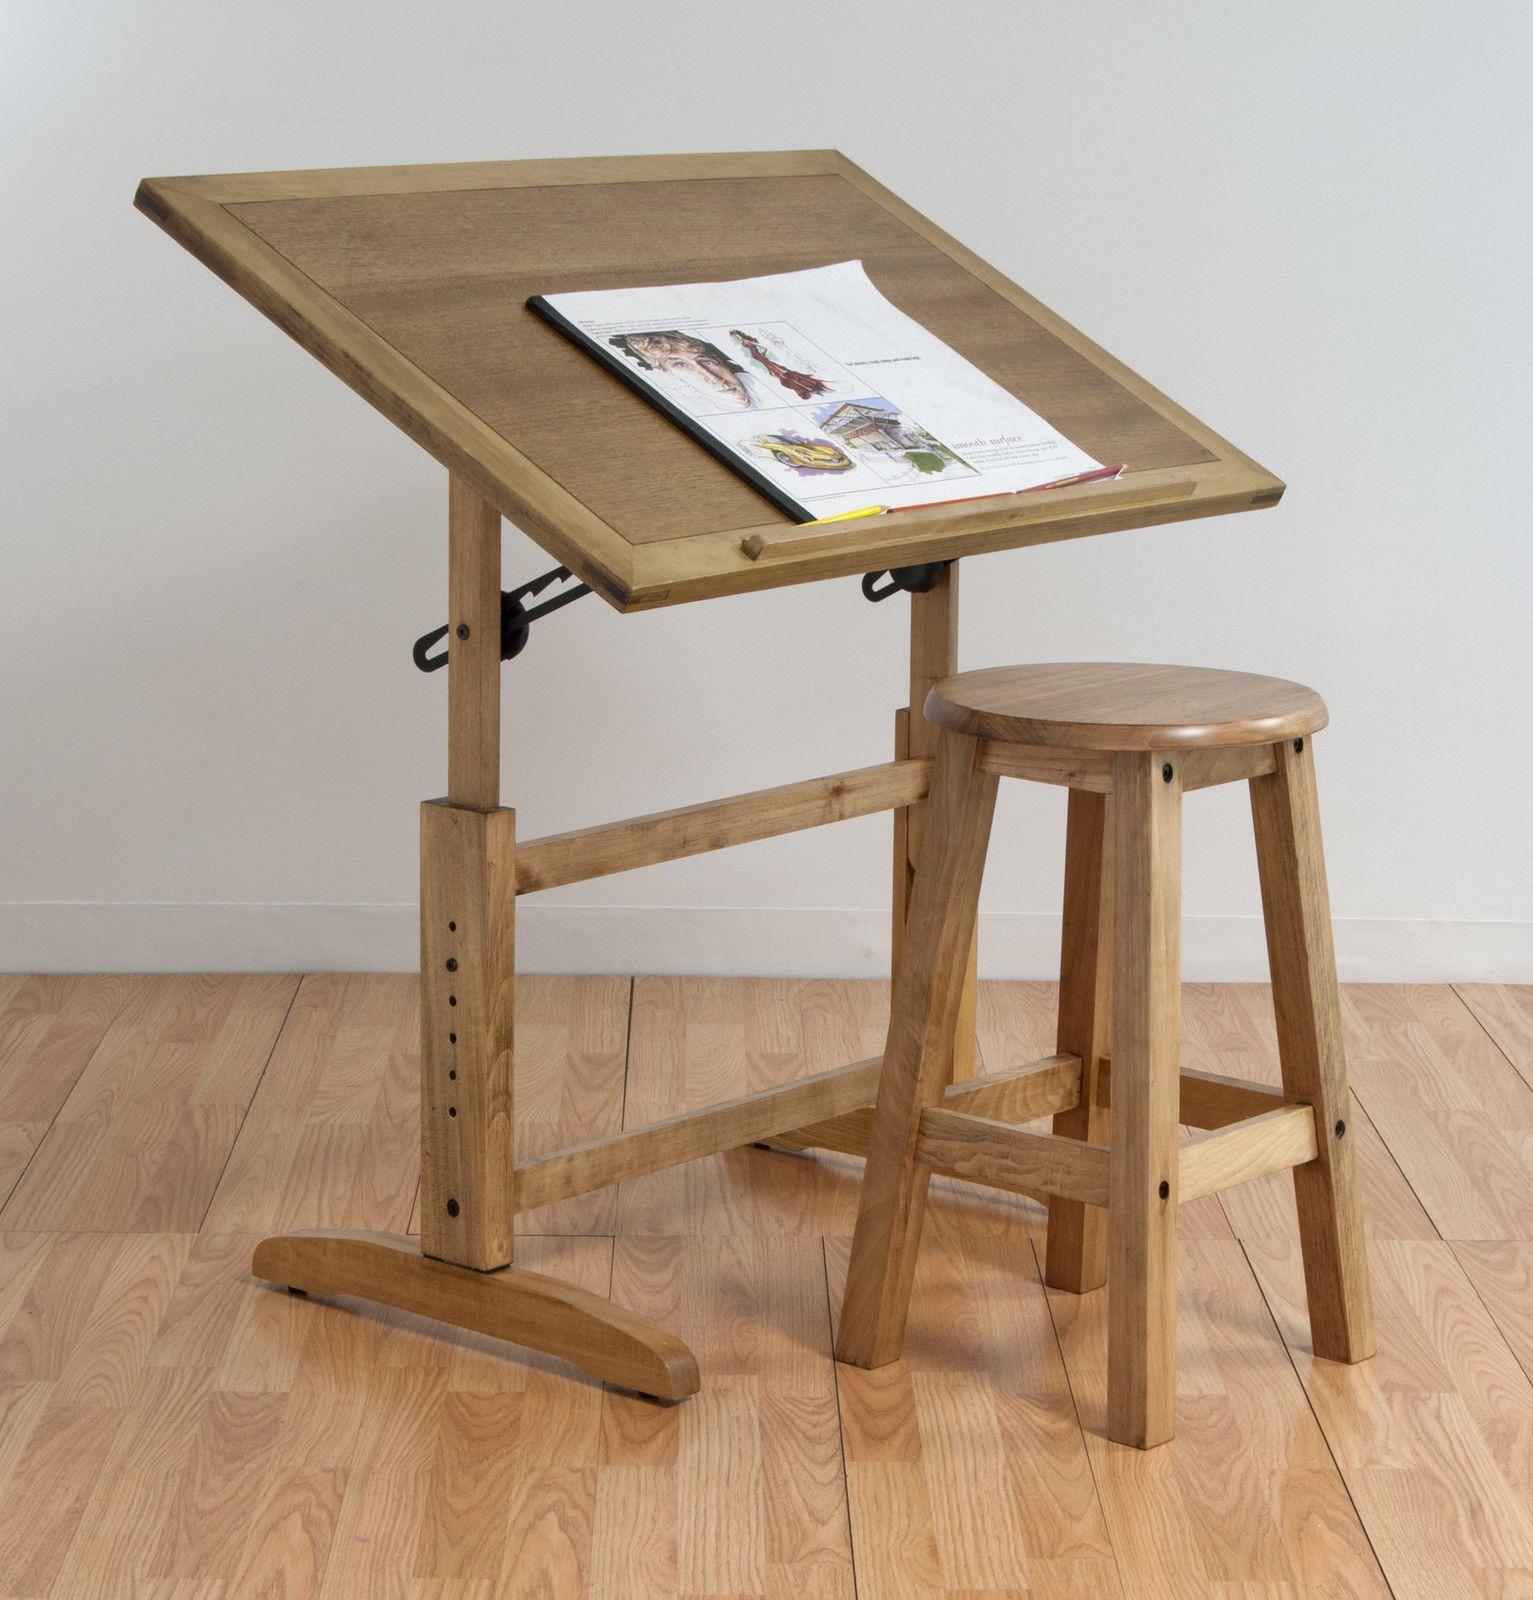 tall drafting table chair ergonomic standing new adjustable wood stool drawing studio